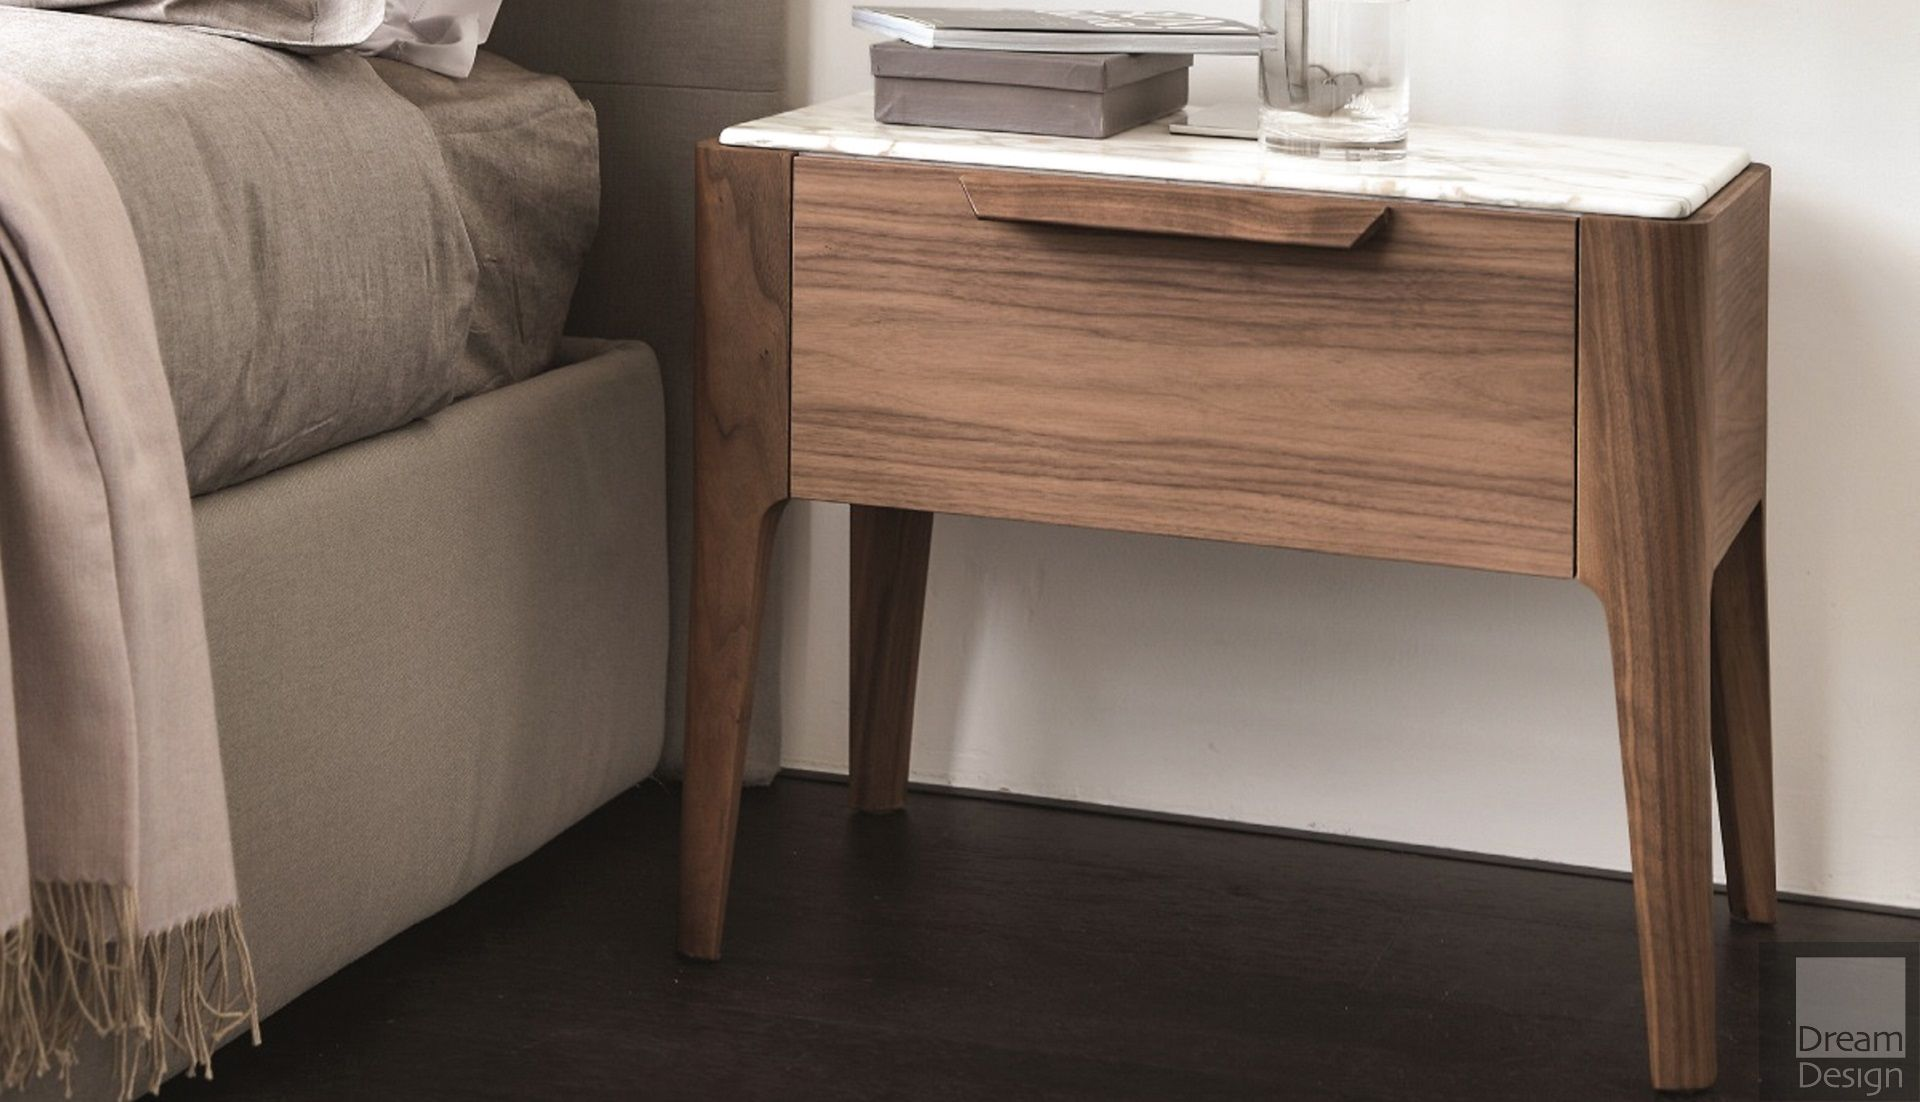 bedroom tables ca images ethan shop merrick allen front en furniture night table null